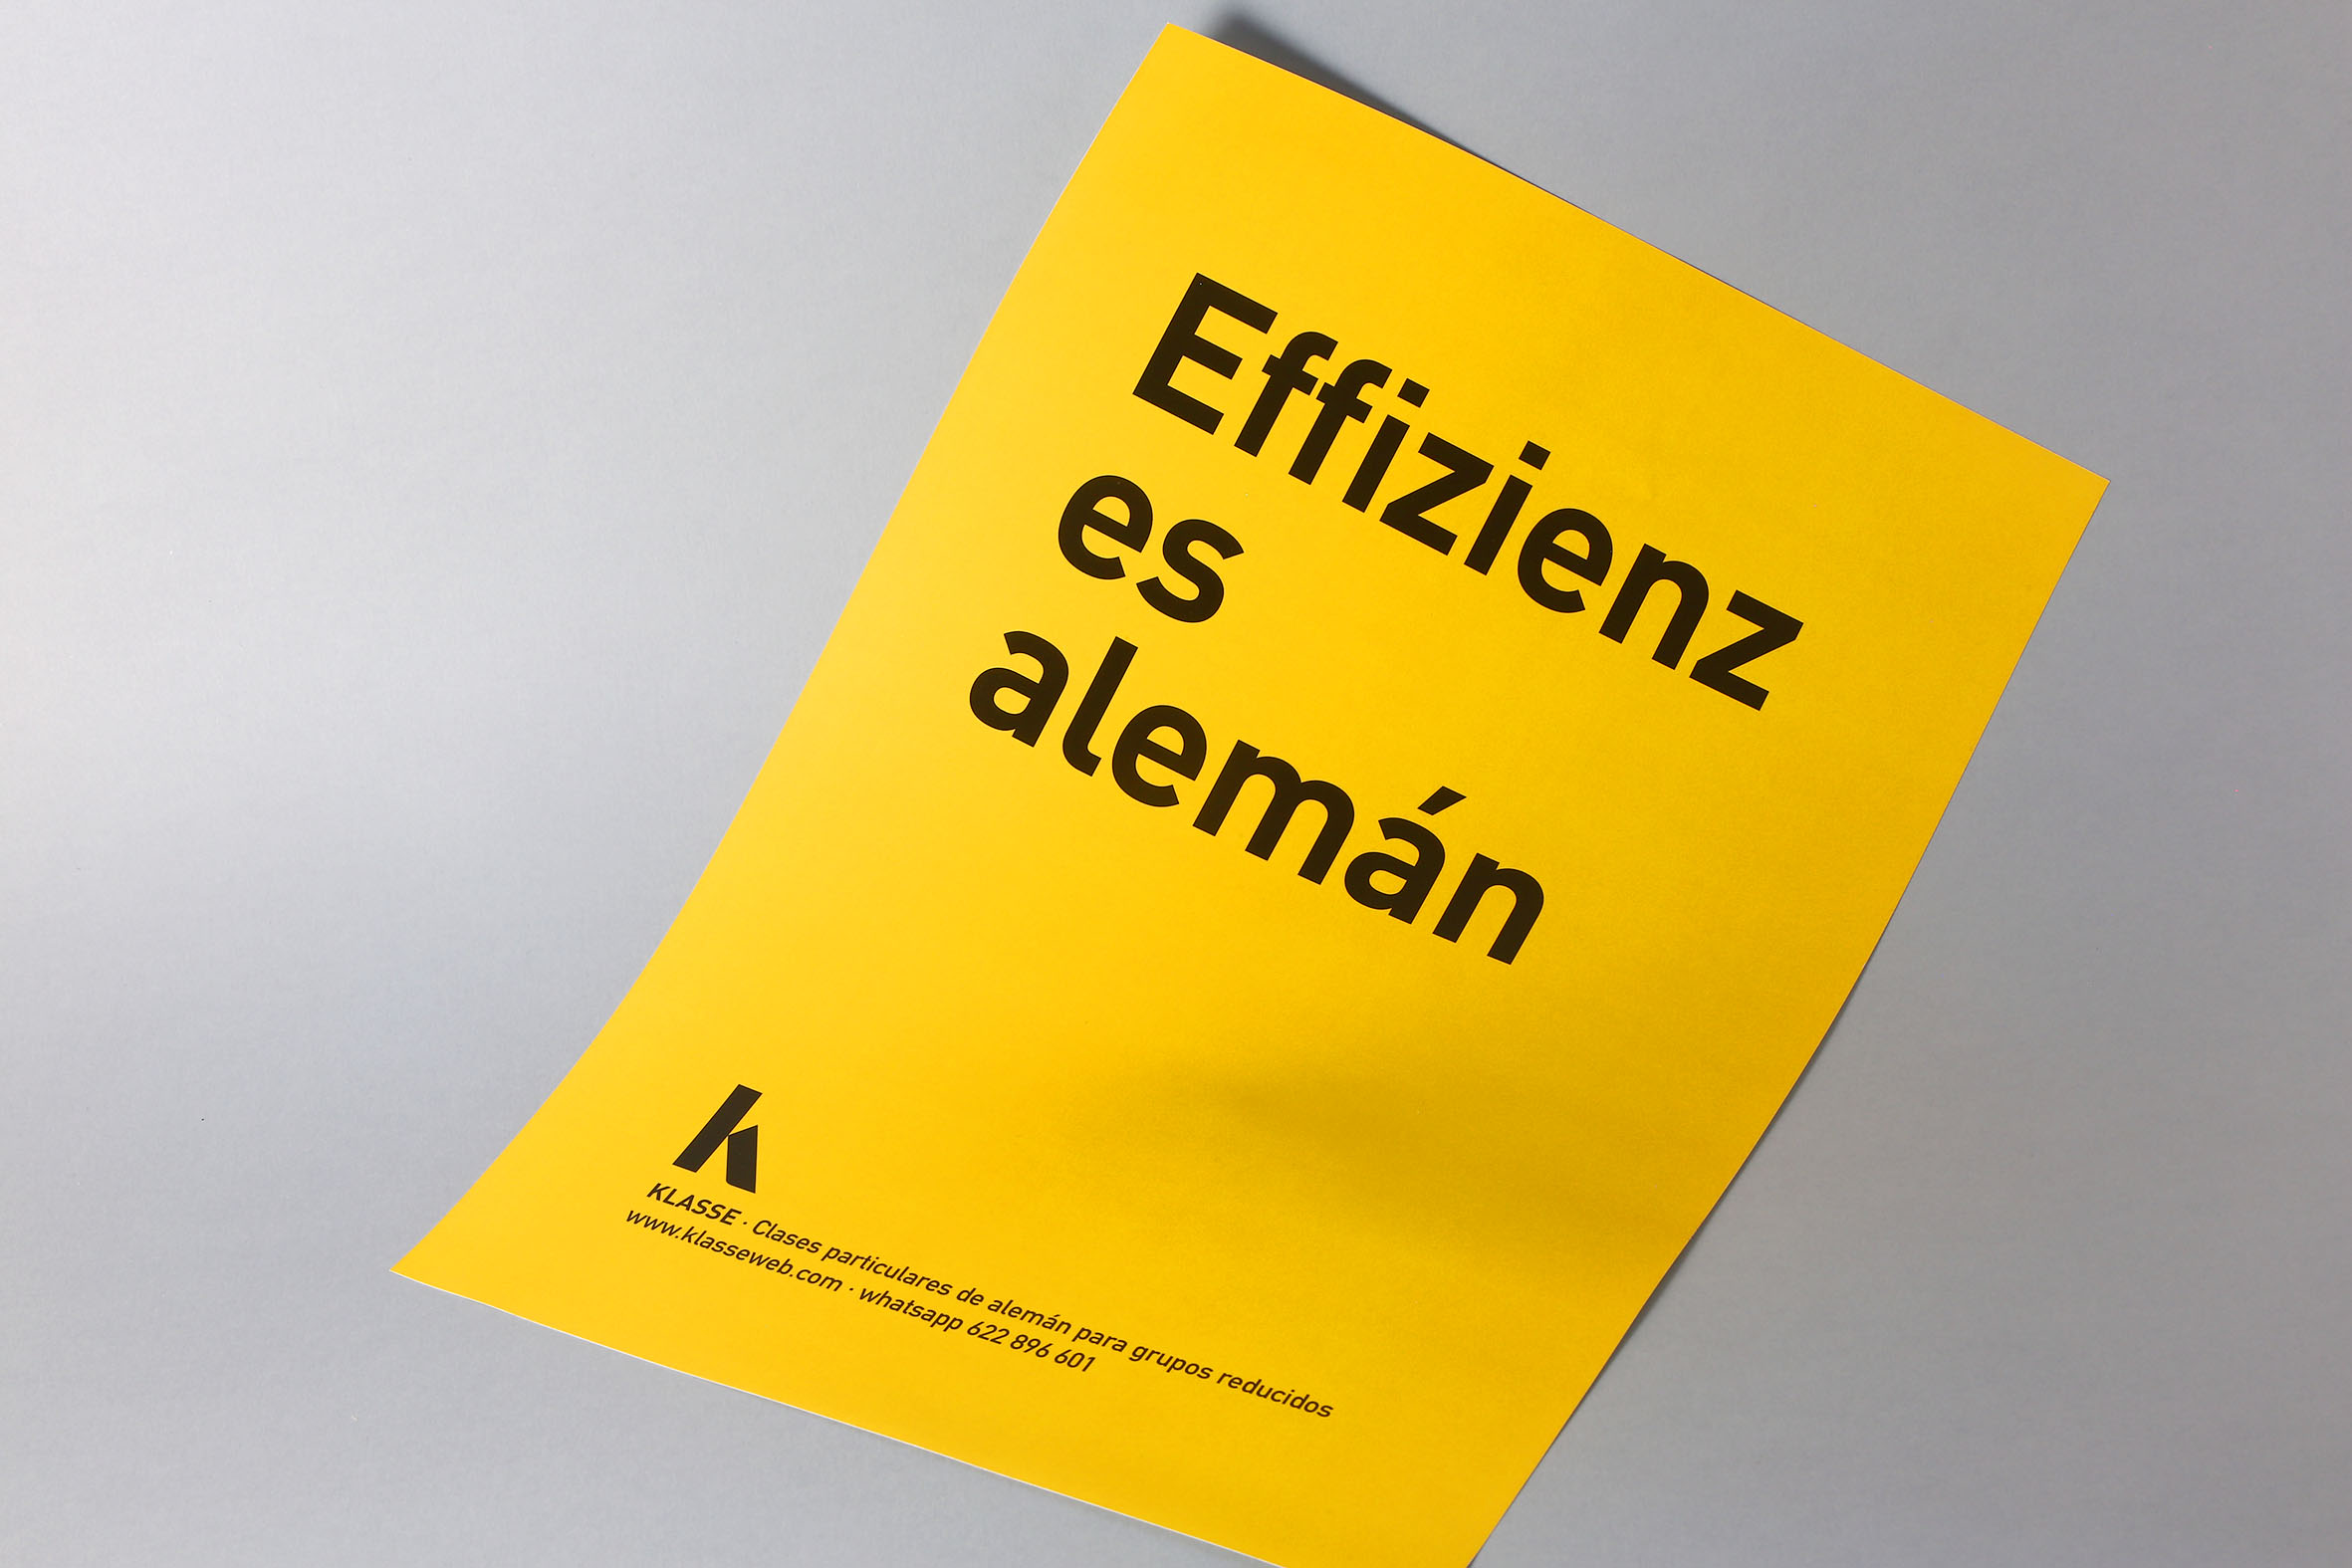 Poster-Klasse-Efficienz-Daniel-Cavalcanti